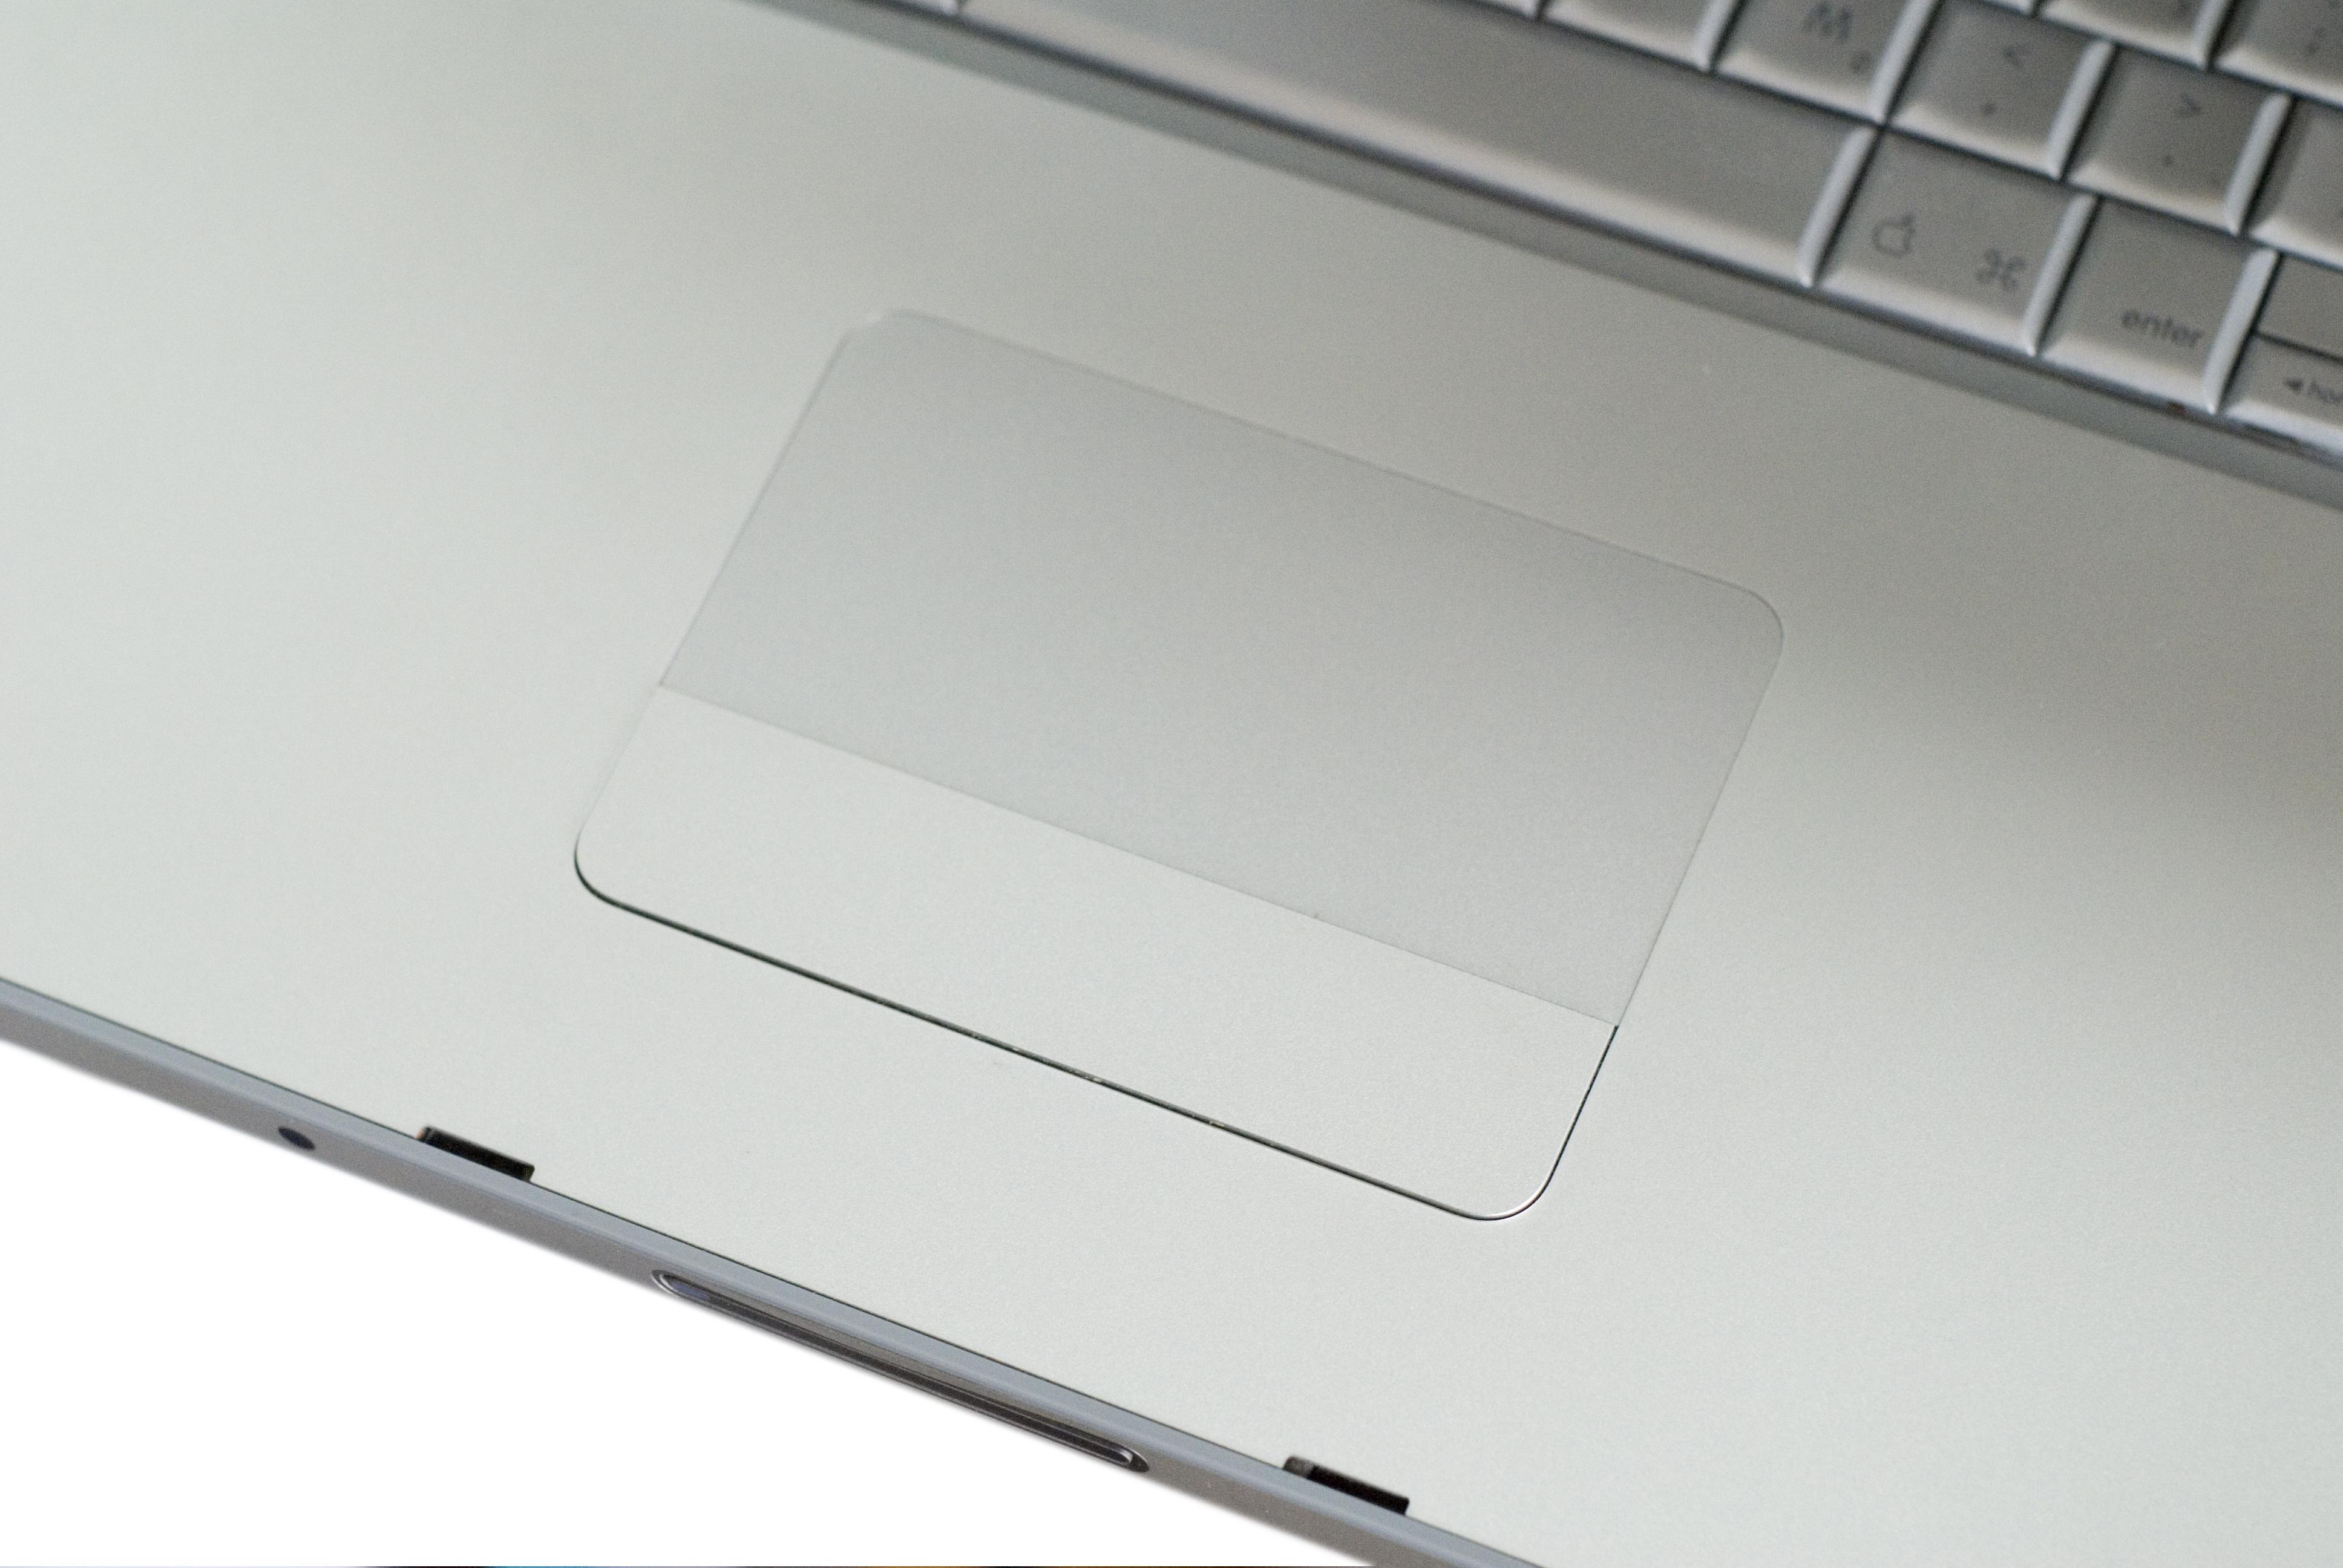 File:Macbook pro trackpad.jpg - Wikipedia, the free encyclopedia